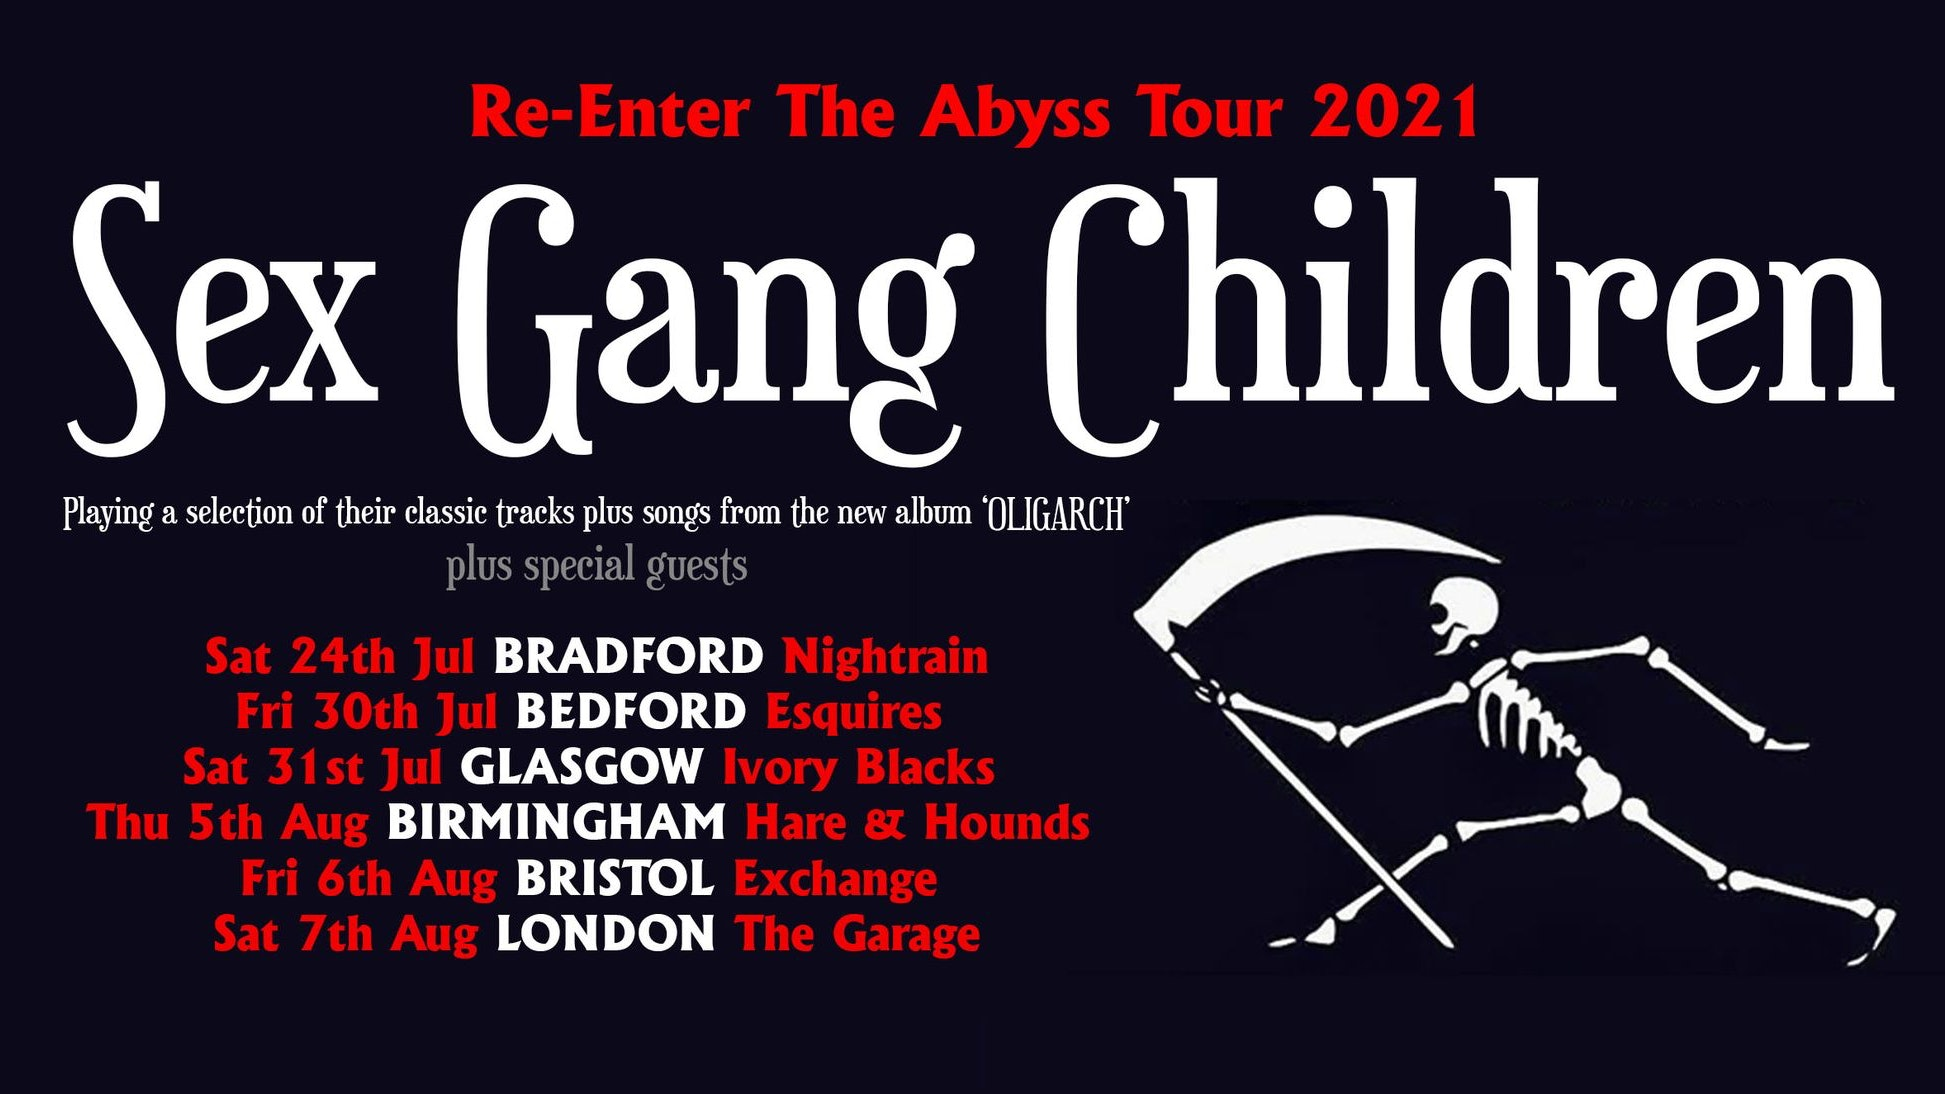 Sex Gang Children Re-Enter The Abyss Tour 2021 – Bradford